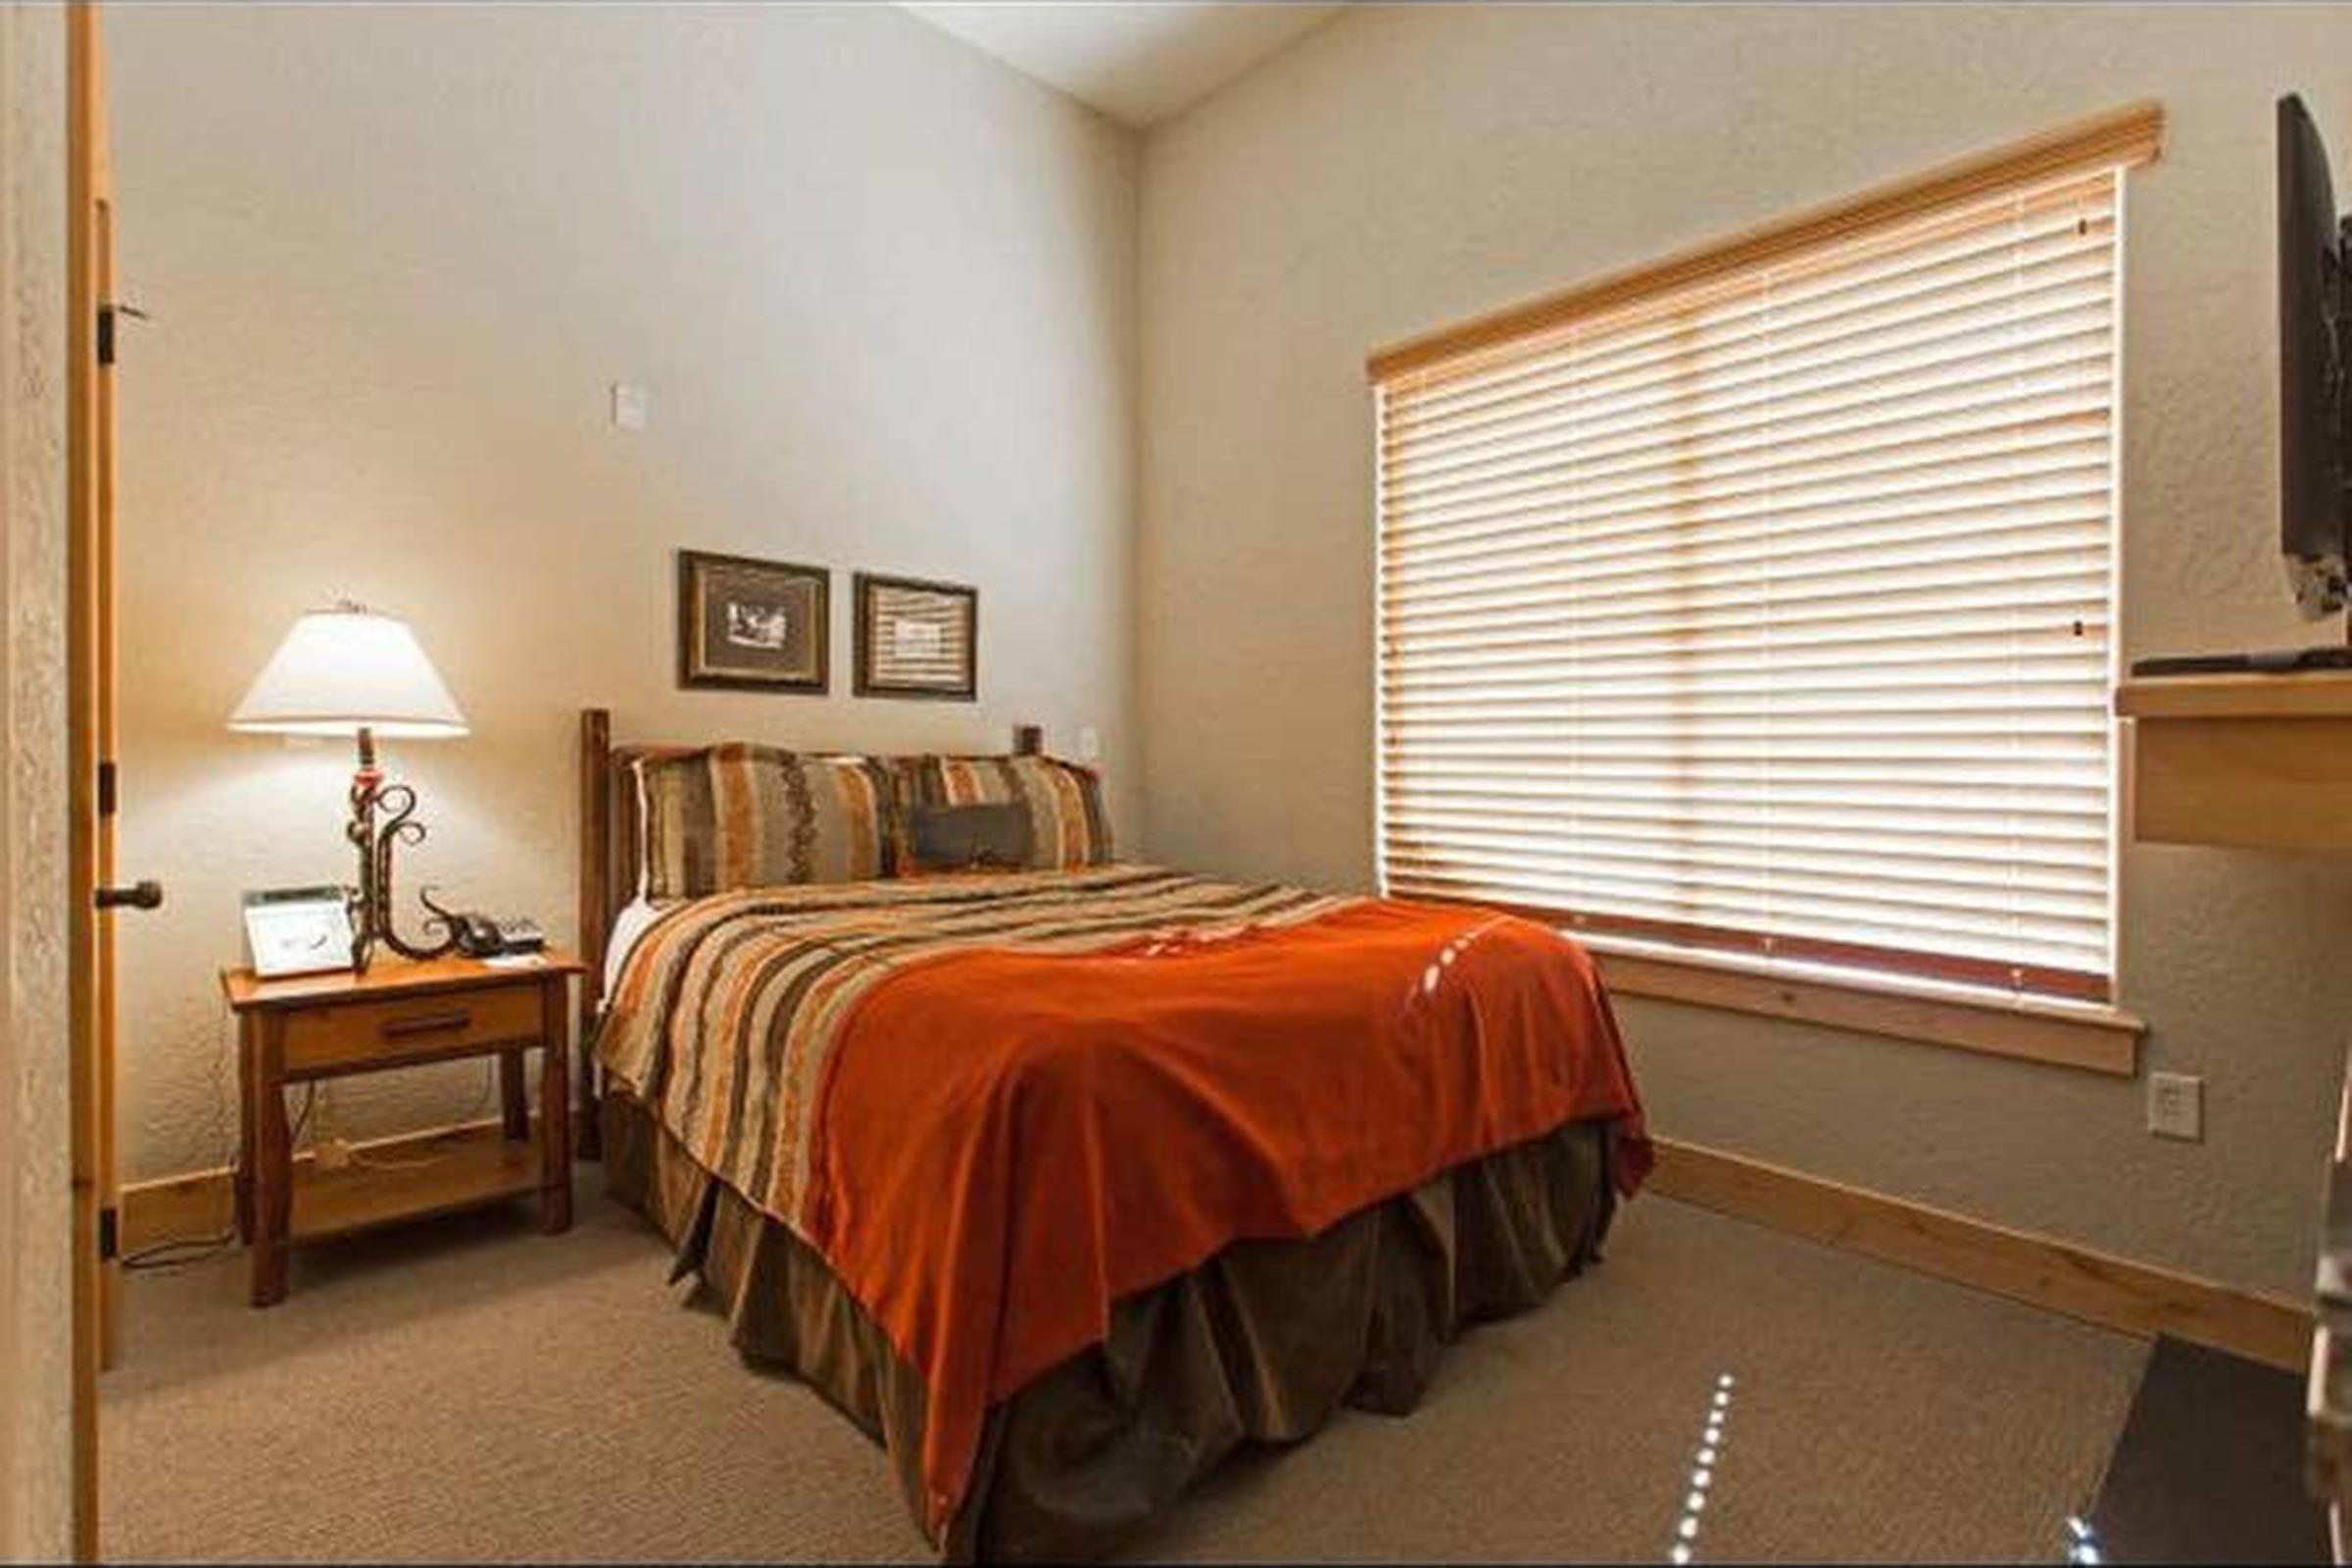 44_Utah--Resort-style-condo-in-Park-City